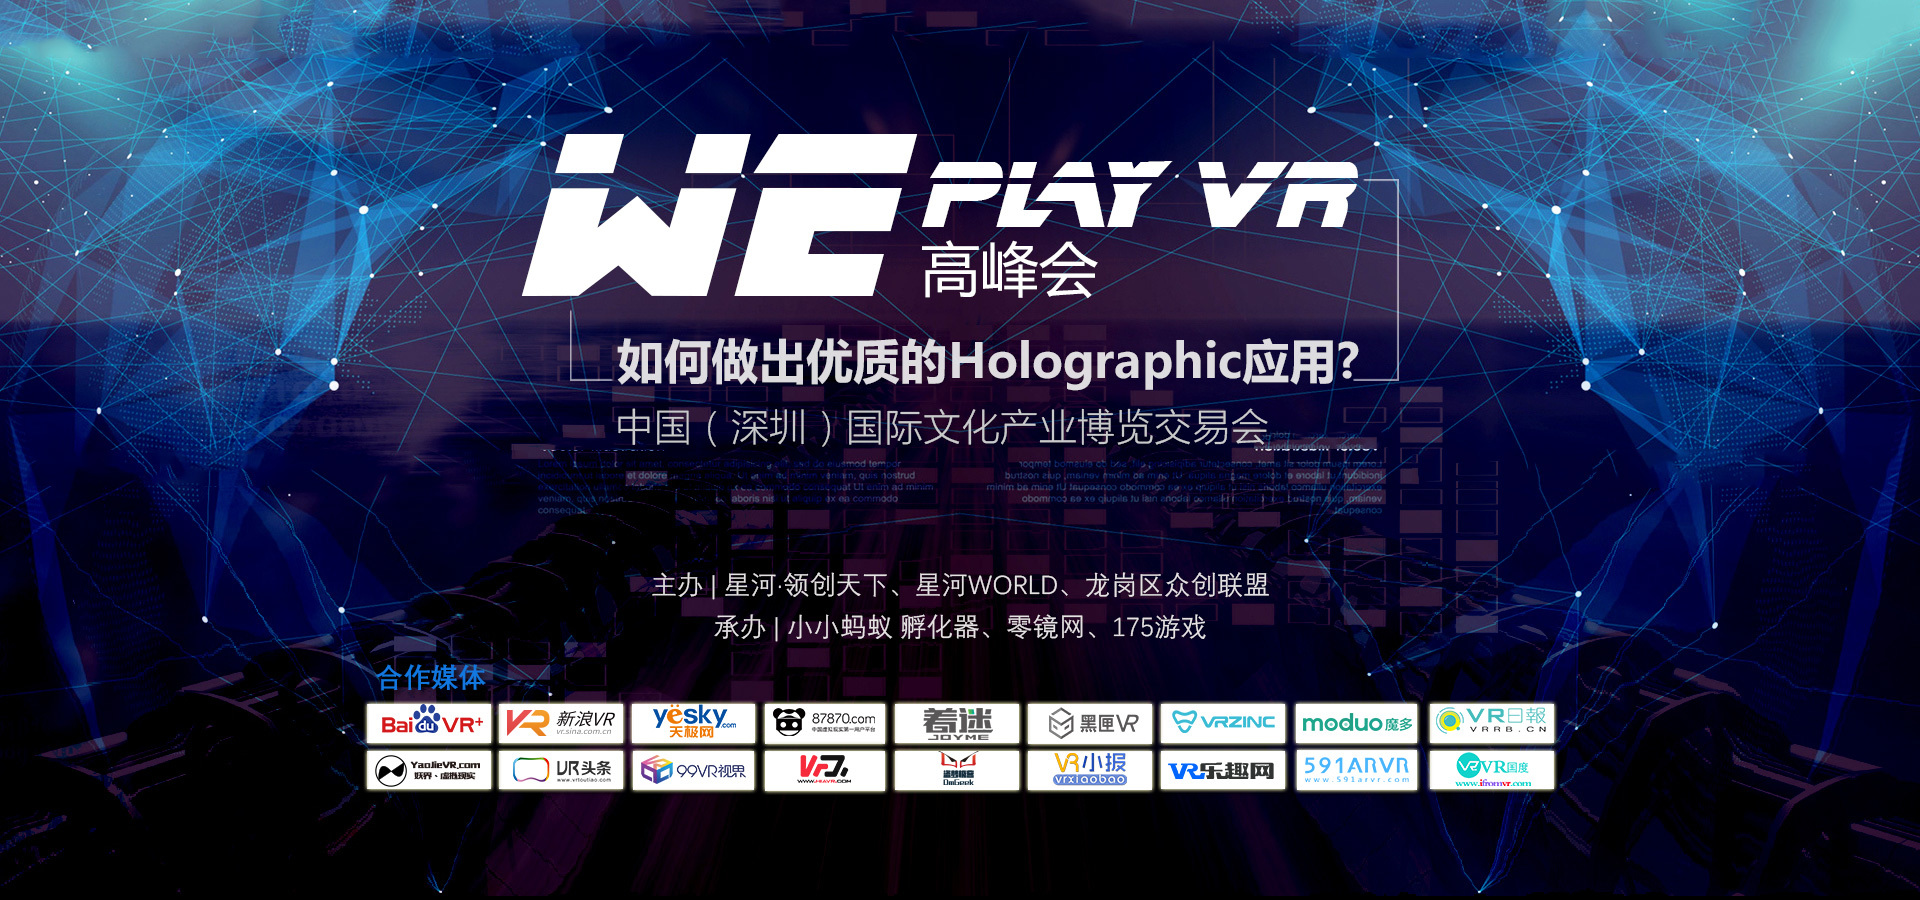 WE PLAY VR高峰会——如何做出优质的holographic应用?